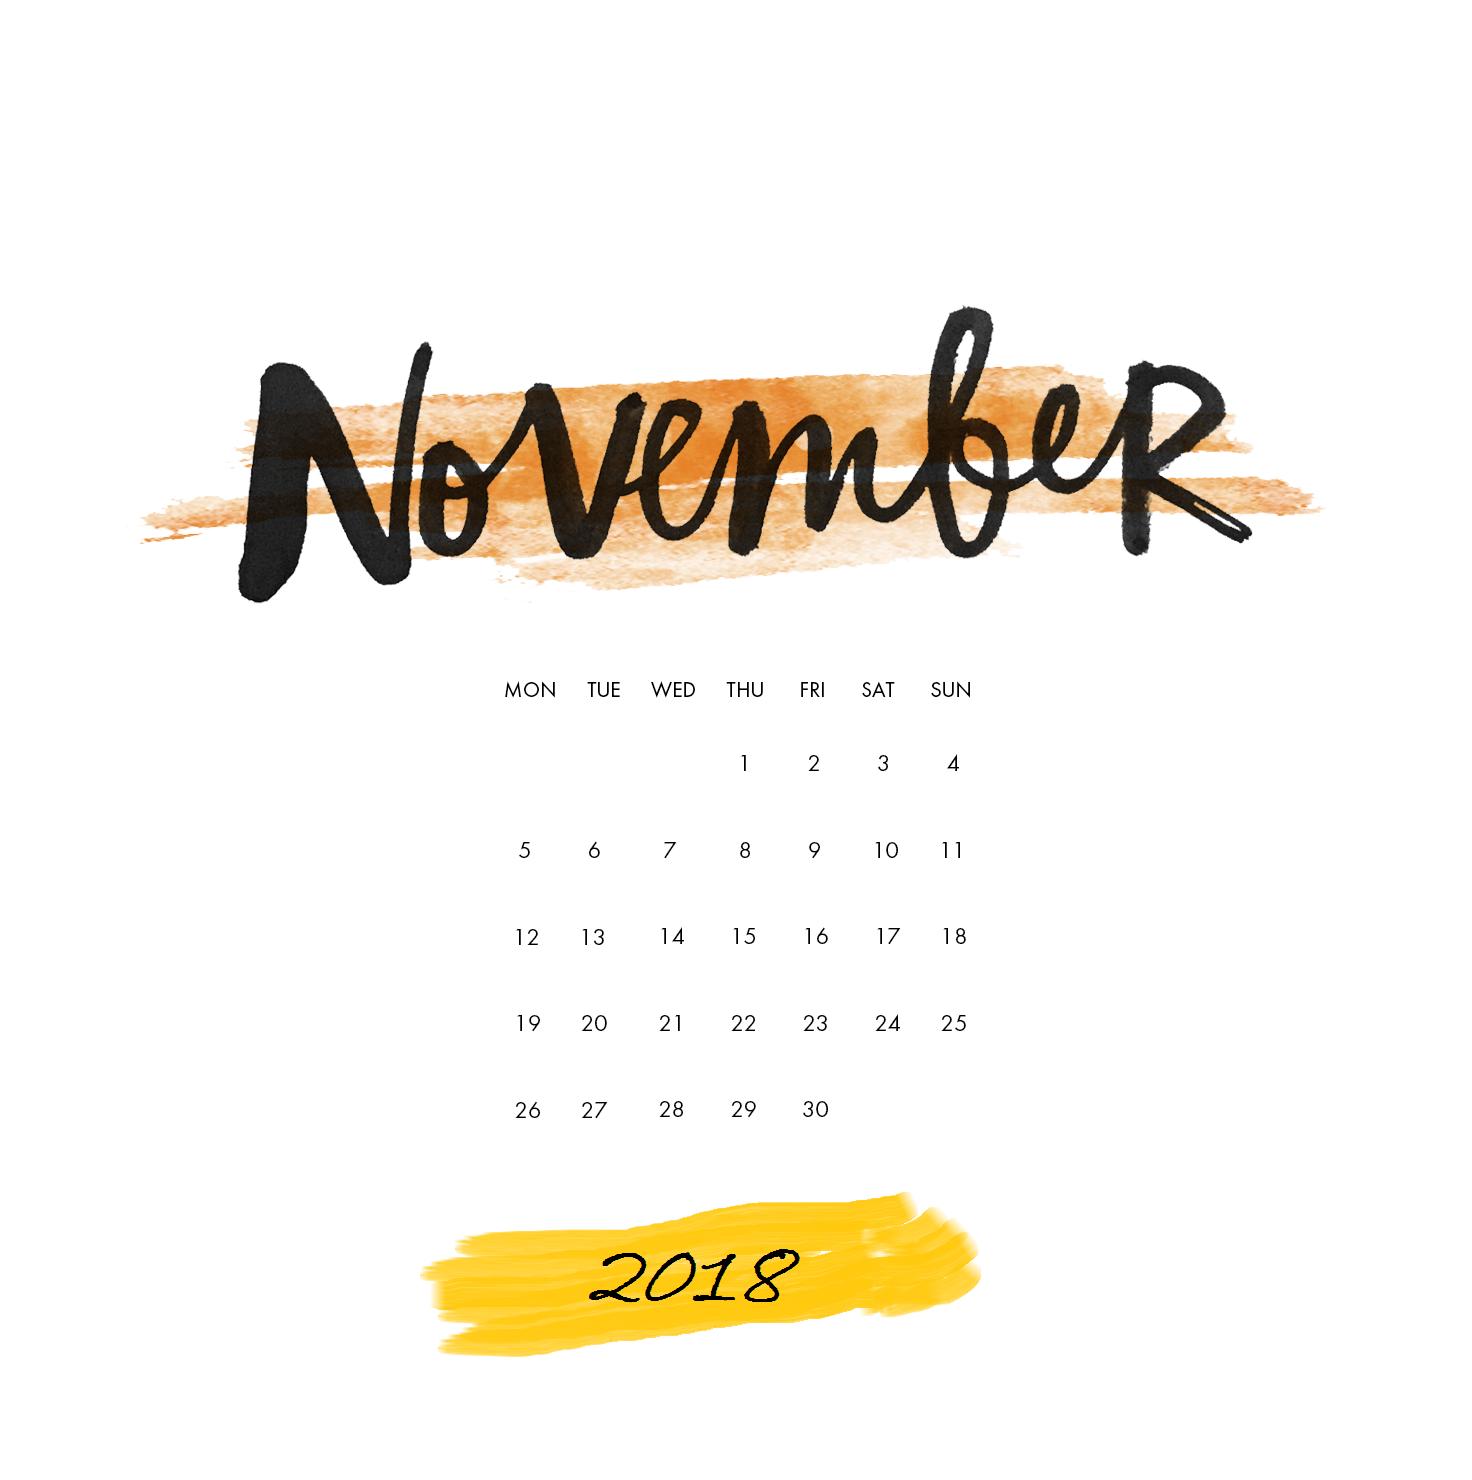 November 2018 Ipad Calendar Wallpaper Calendar Wallpaper Desktop Wallpaper Calendar November Wallpaper